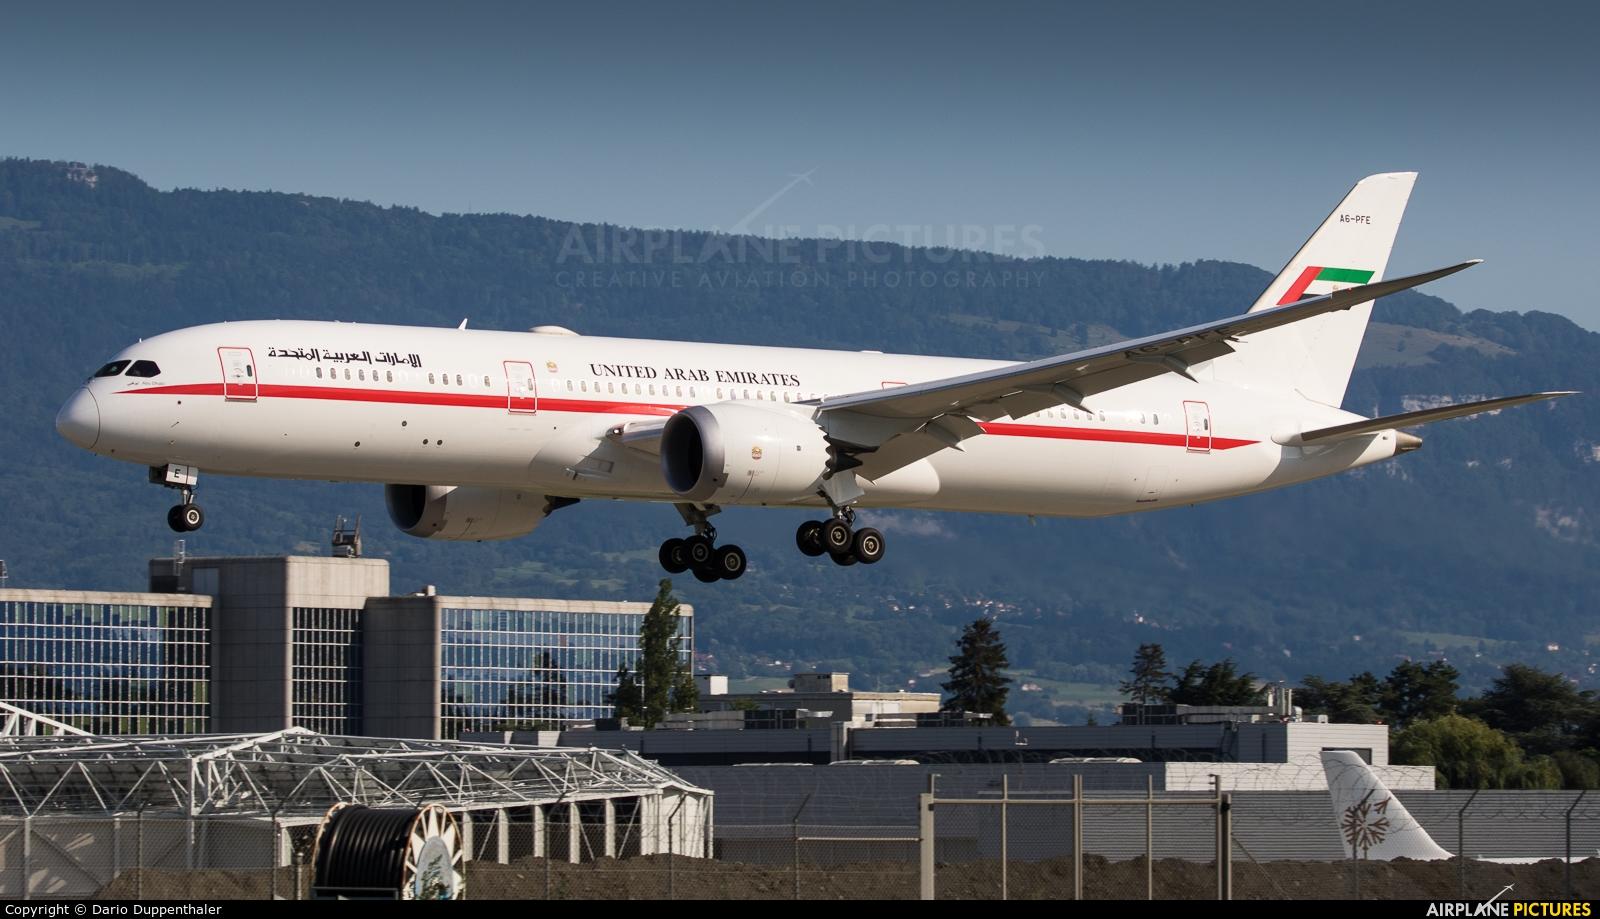 Abu Dhabi Amiri Flight A6-PFE aircraft at Geneva Intl